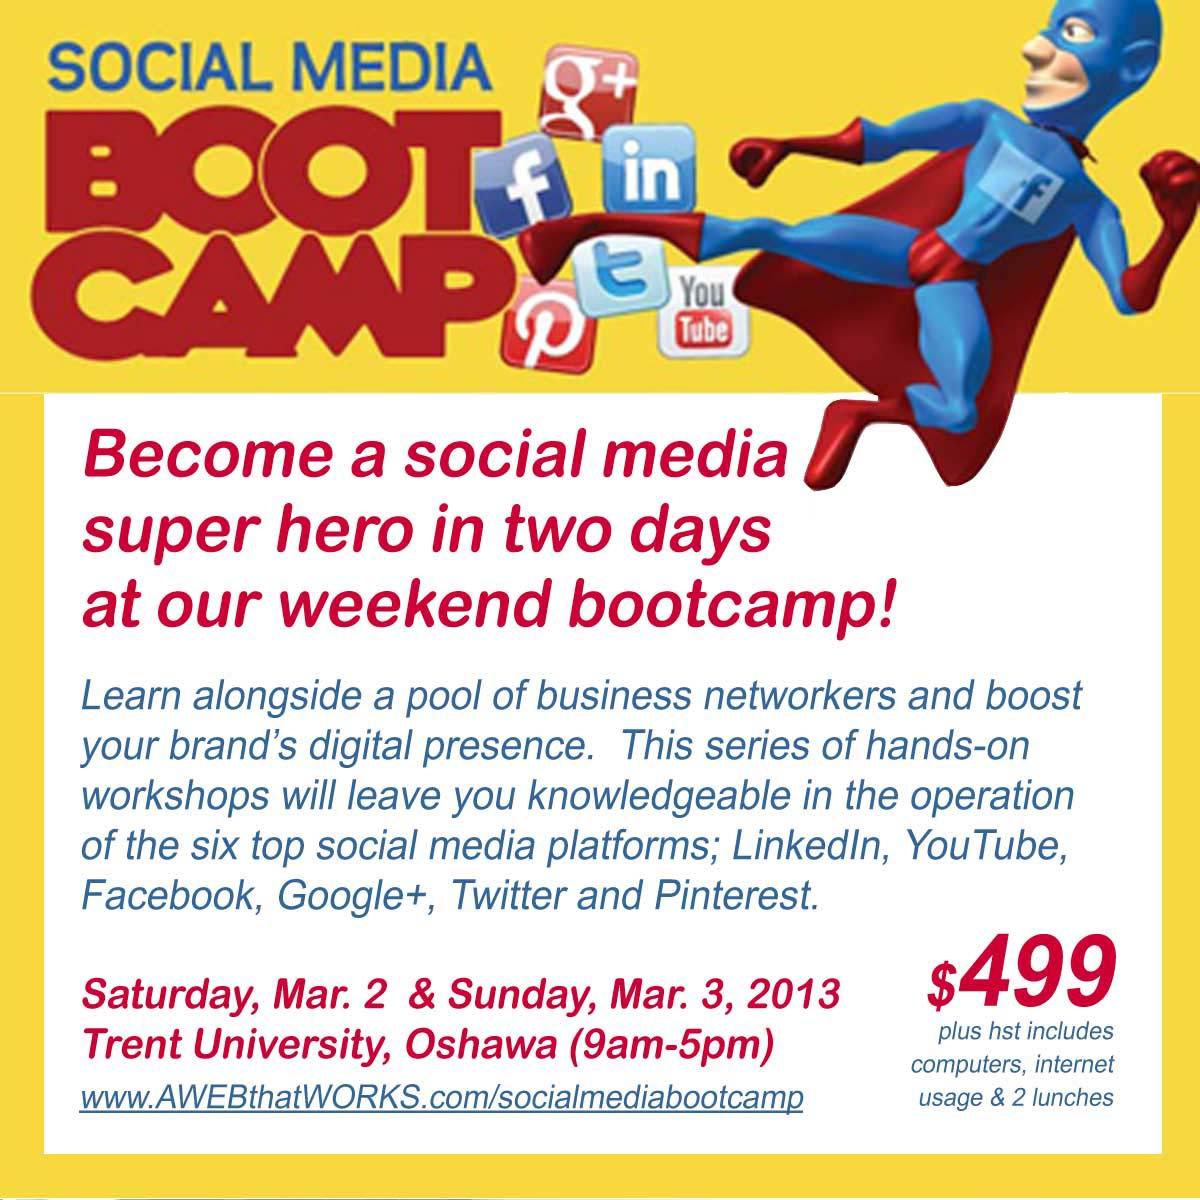 social media bootcamp postcard